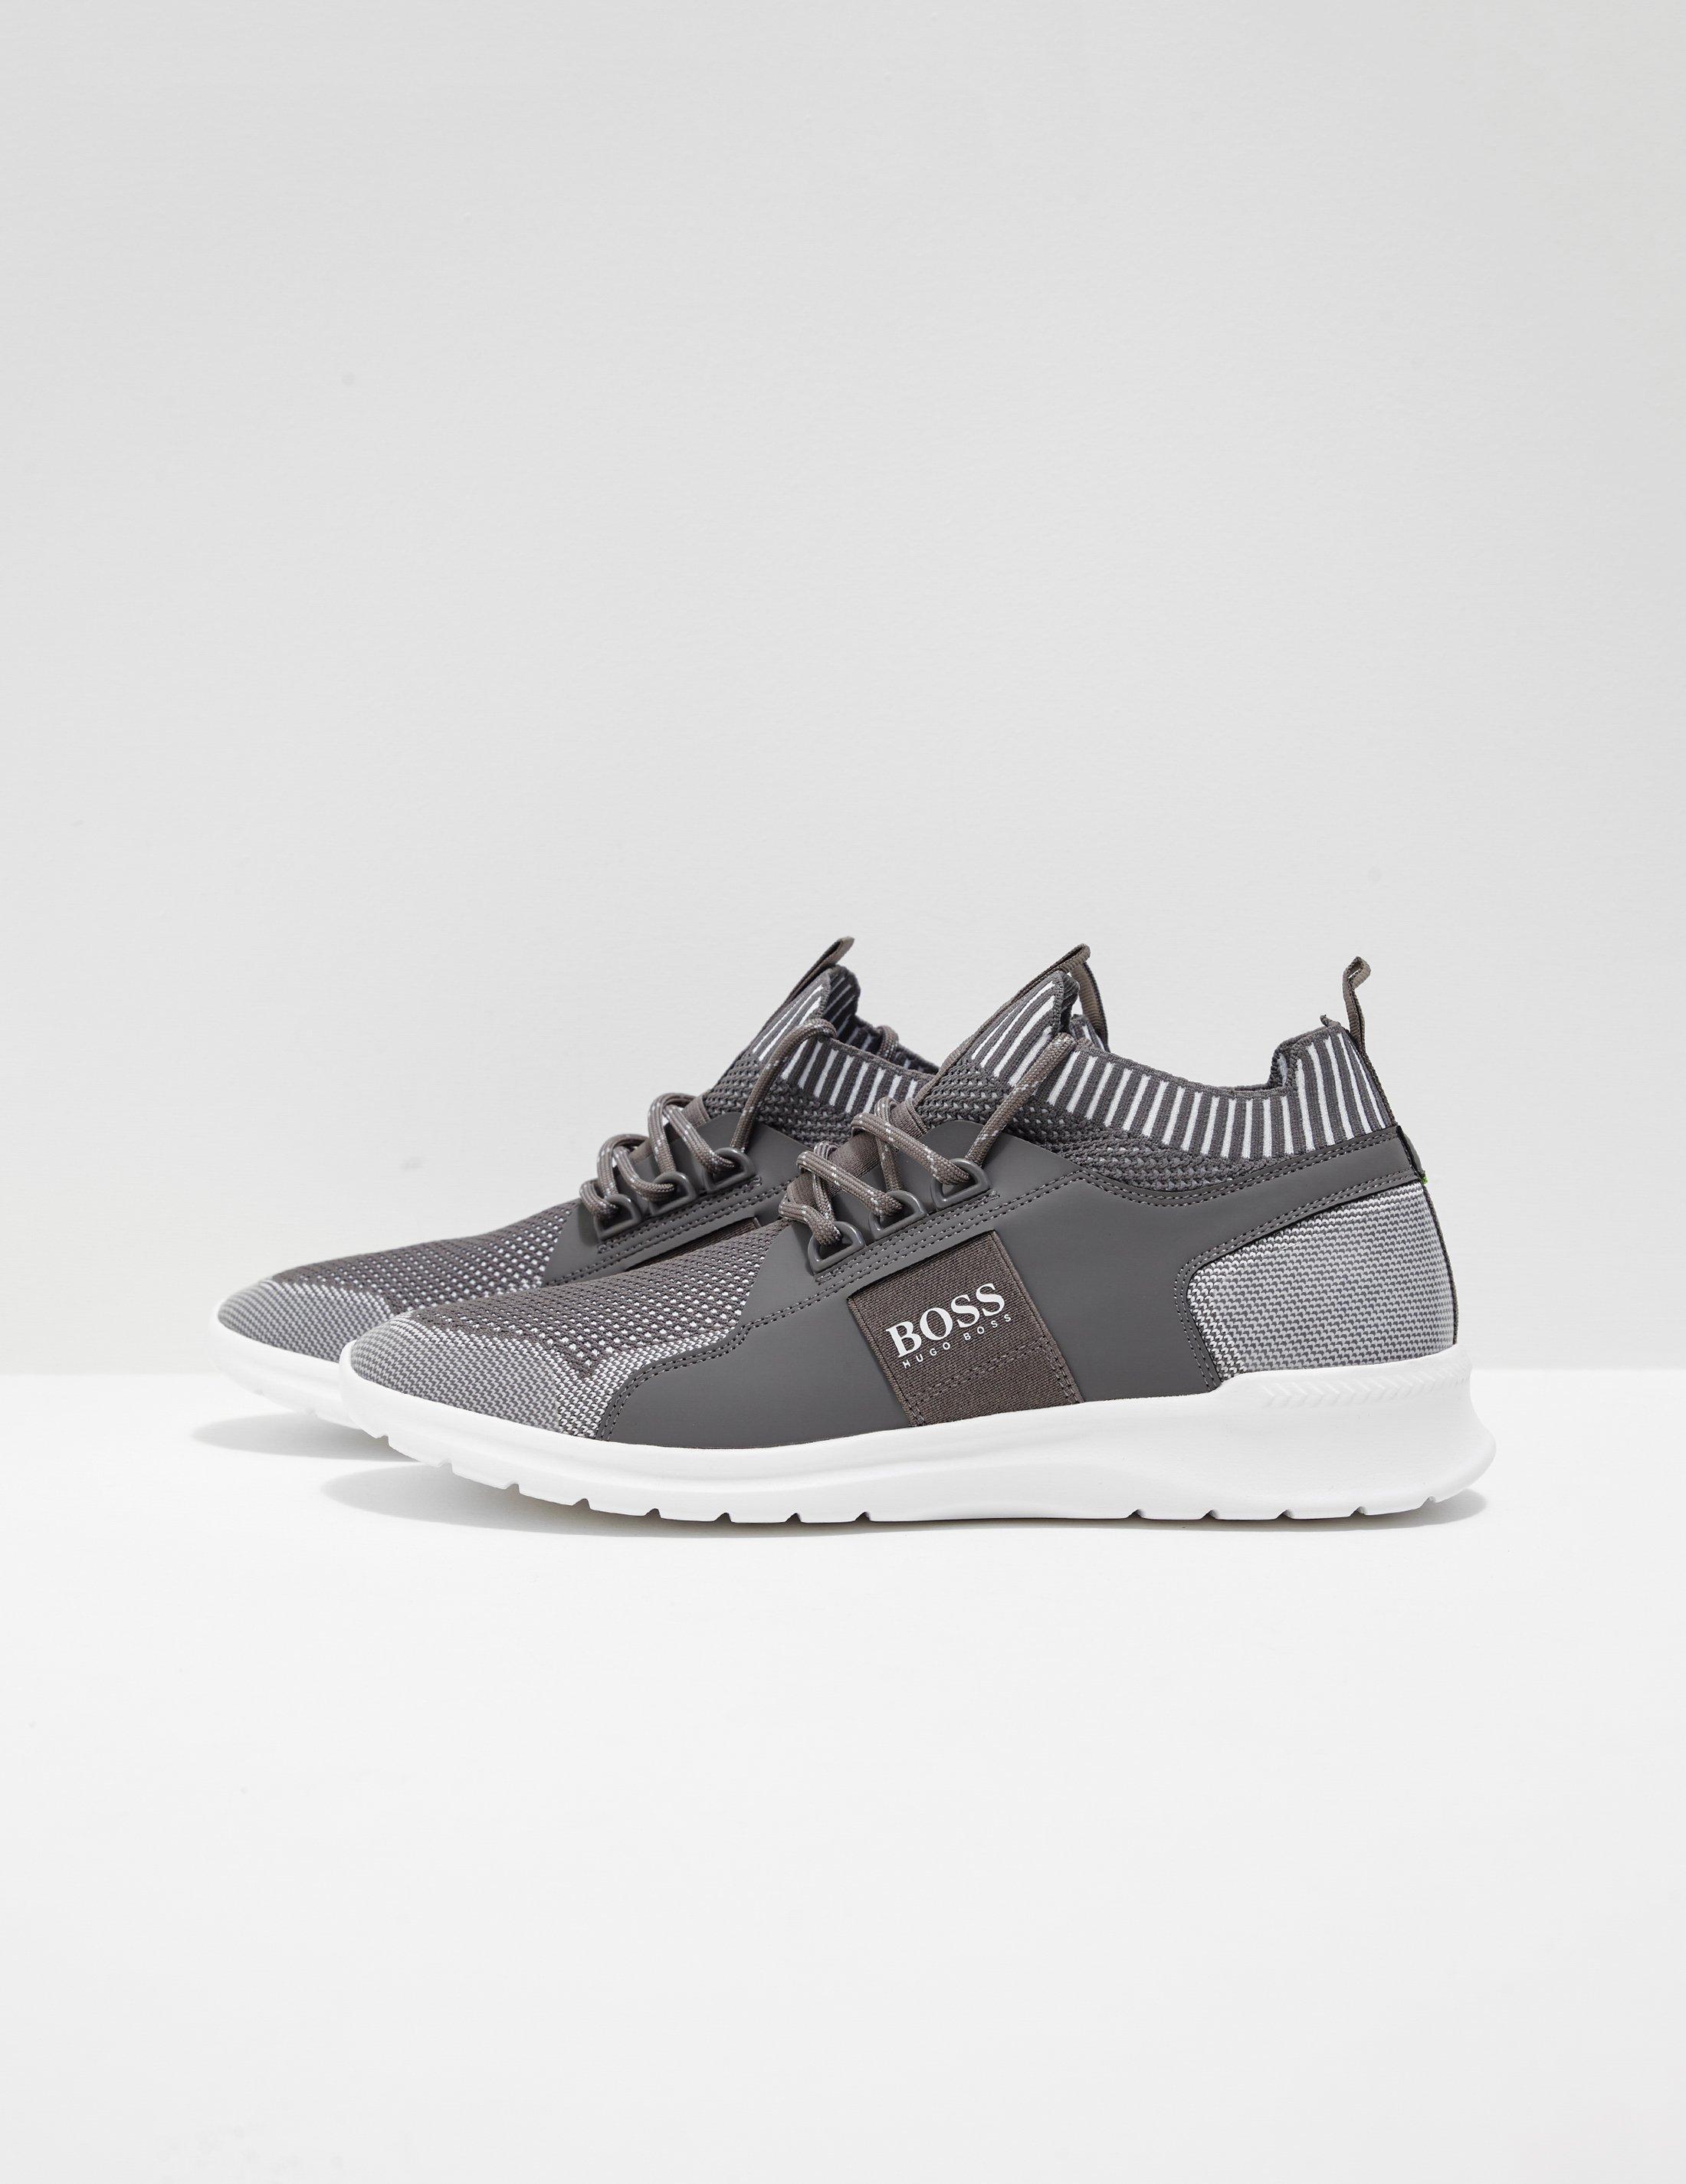 Hugo Boss Lace Extreme Run Knit Grey